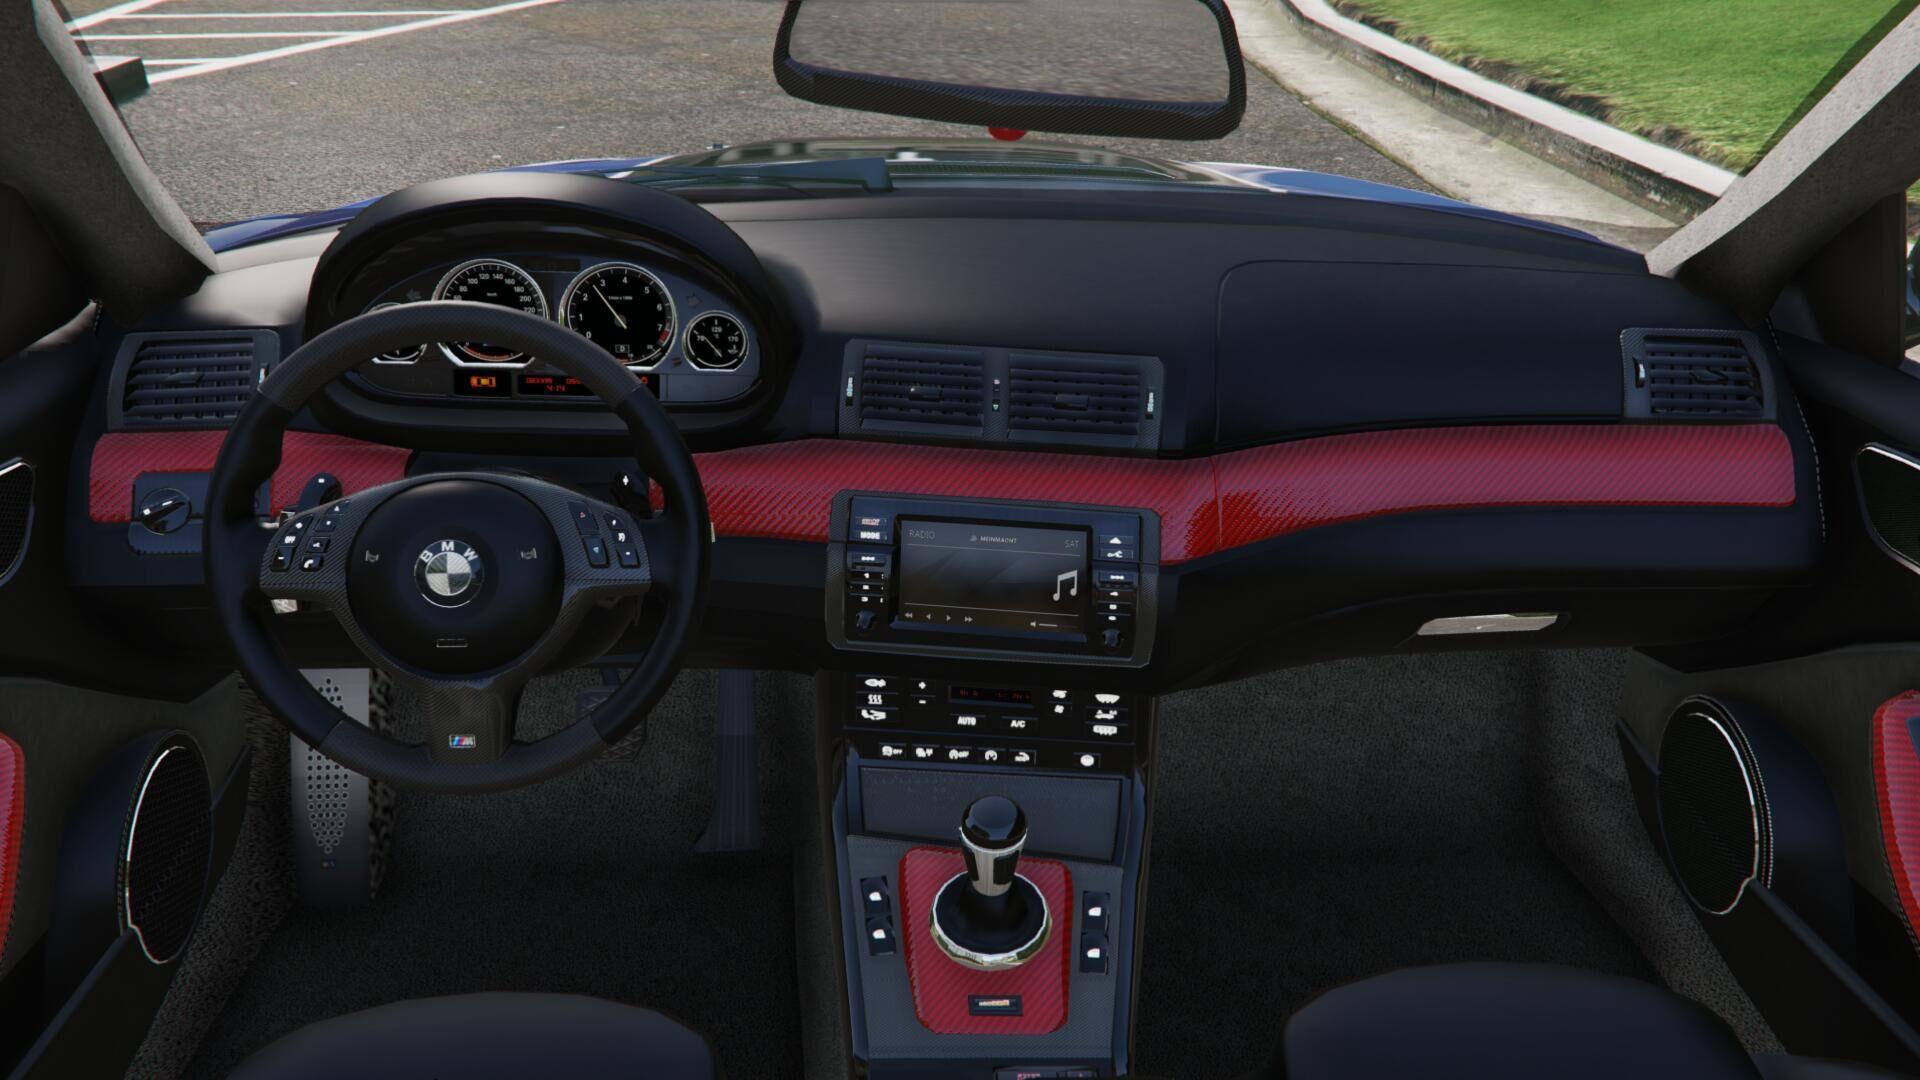 cars gta bmw sport lovely mod mods marvelous of aratorn youtube